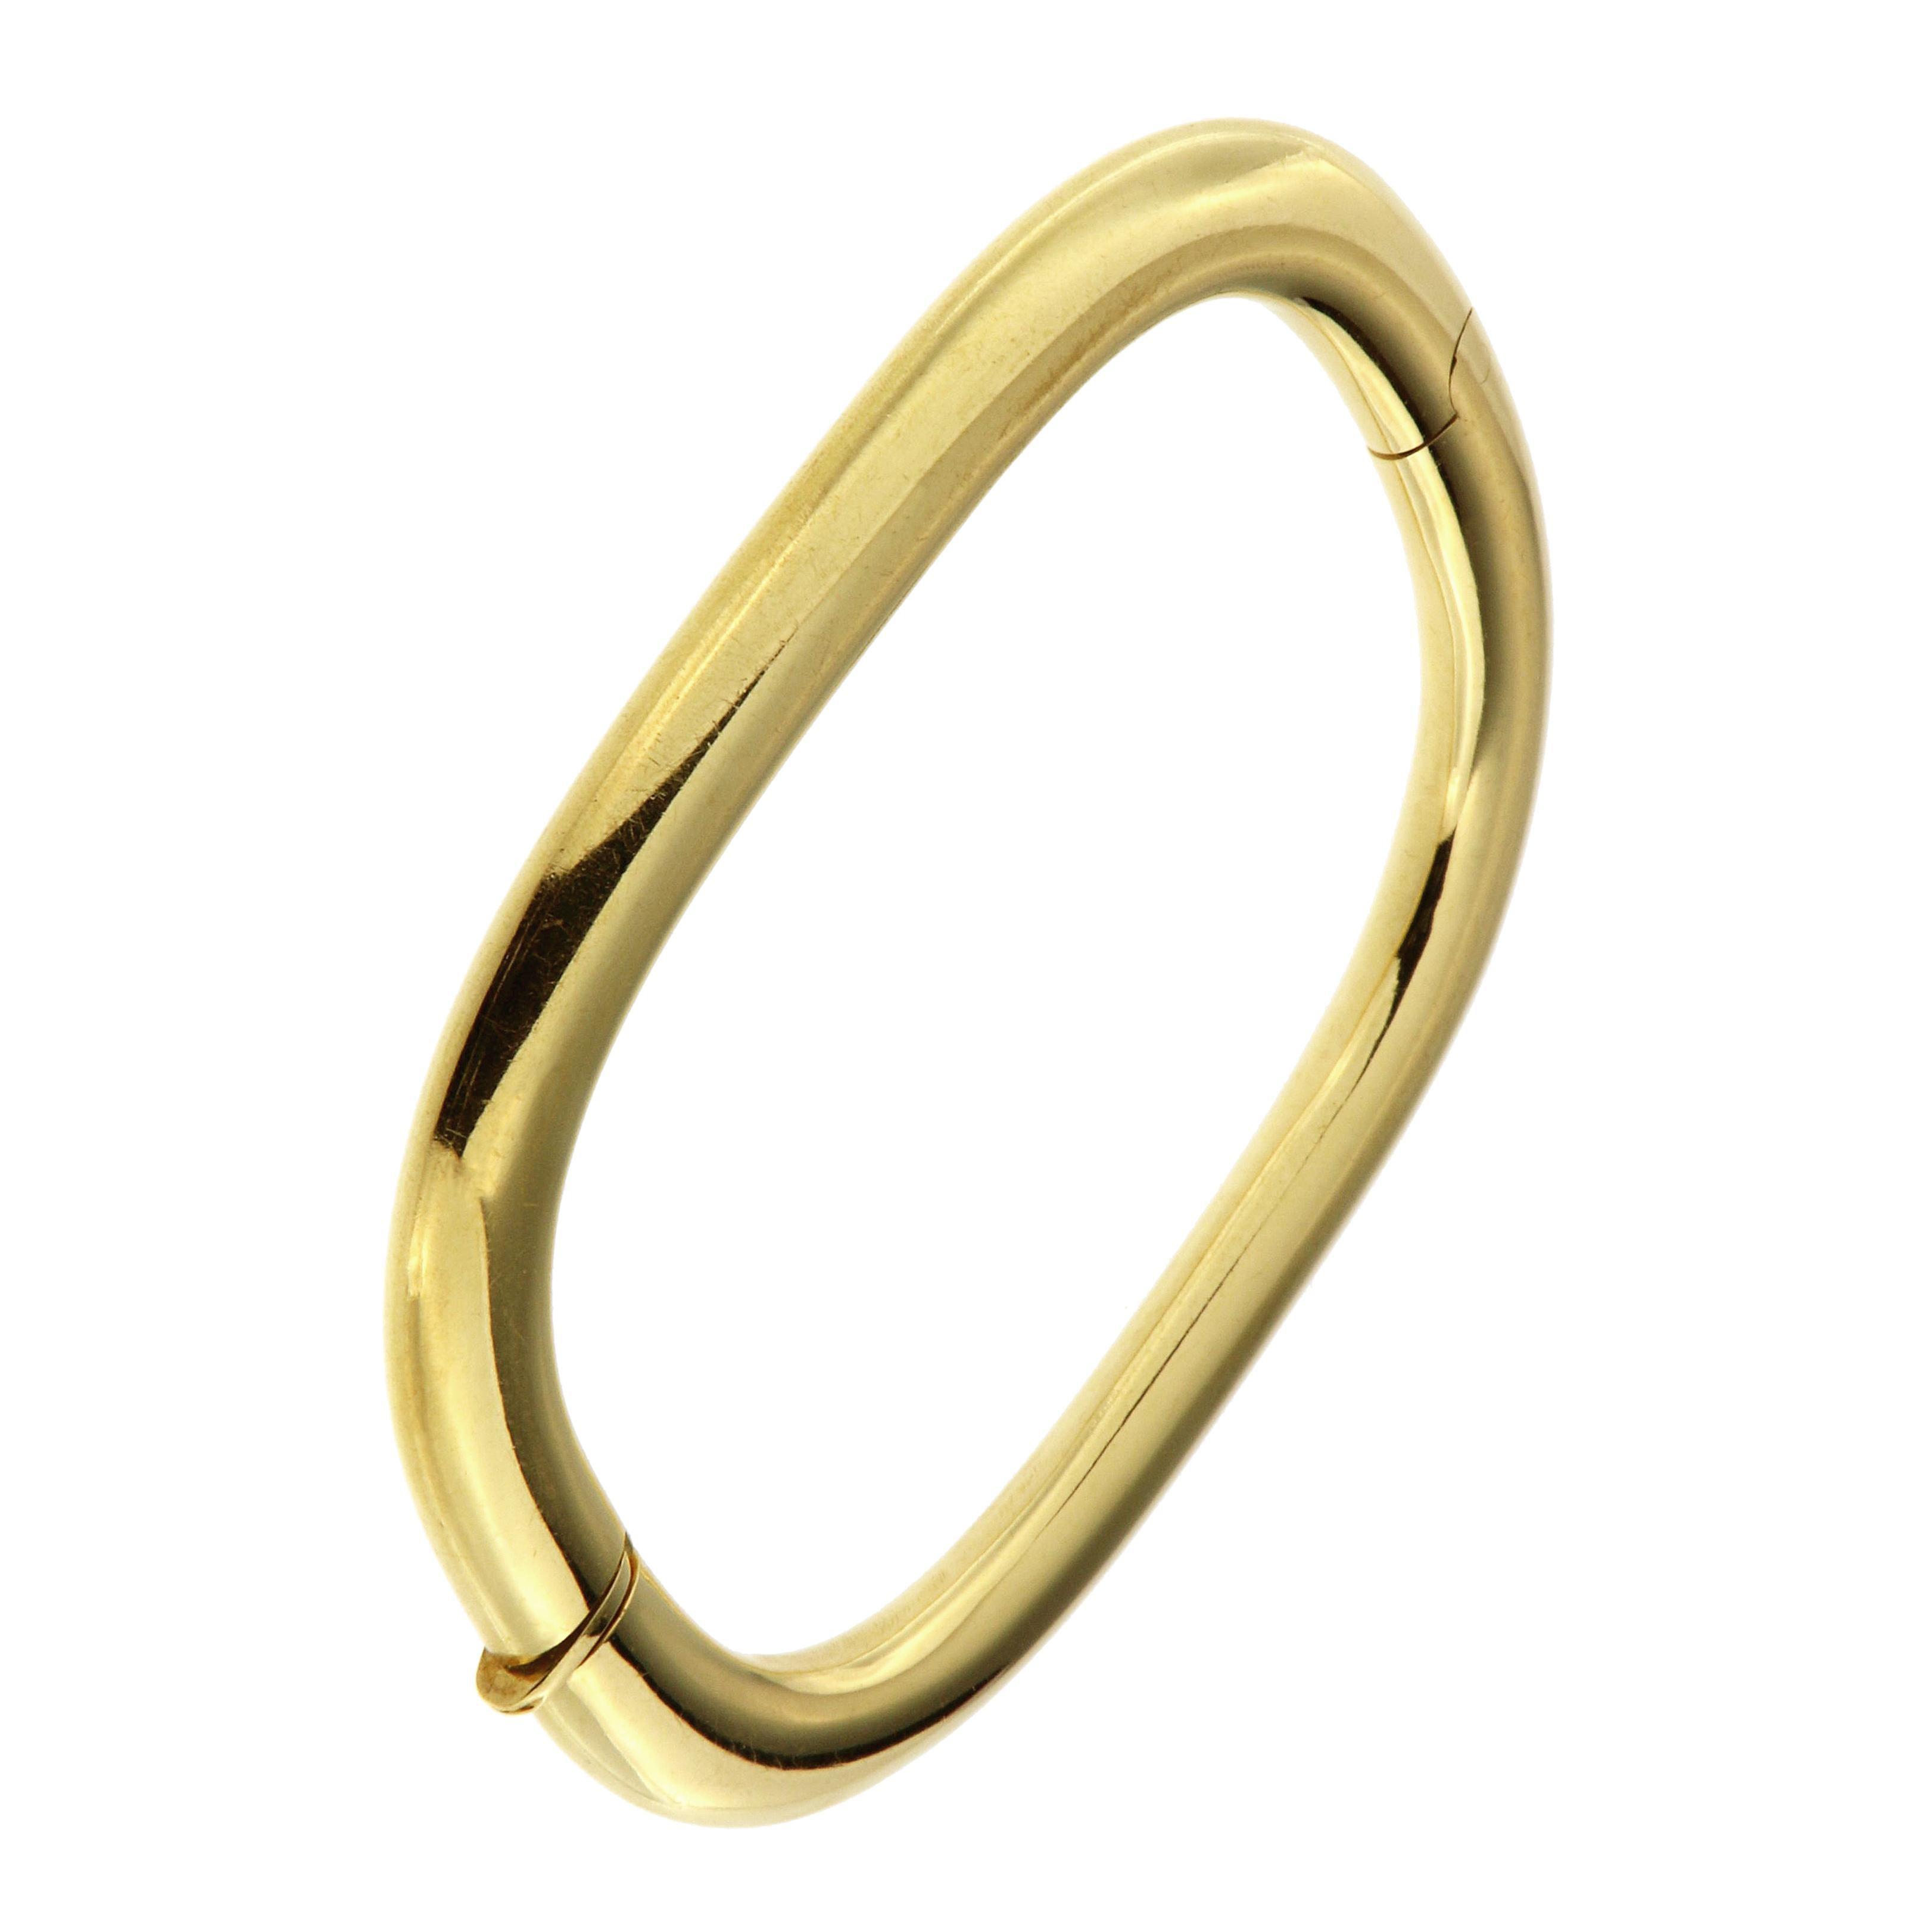 18 Karat Yellow Gold Rigid Cuff Bracelet Handcrafted in Italy